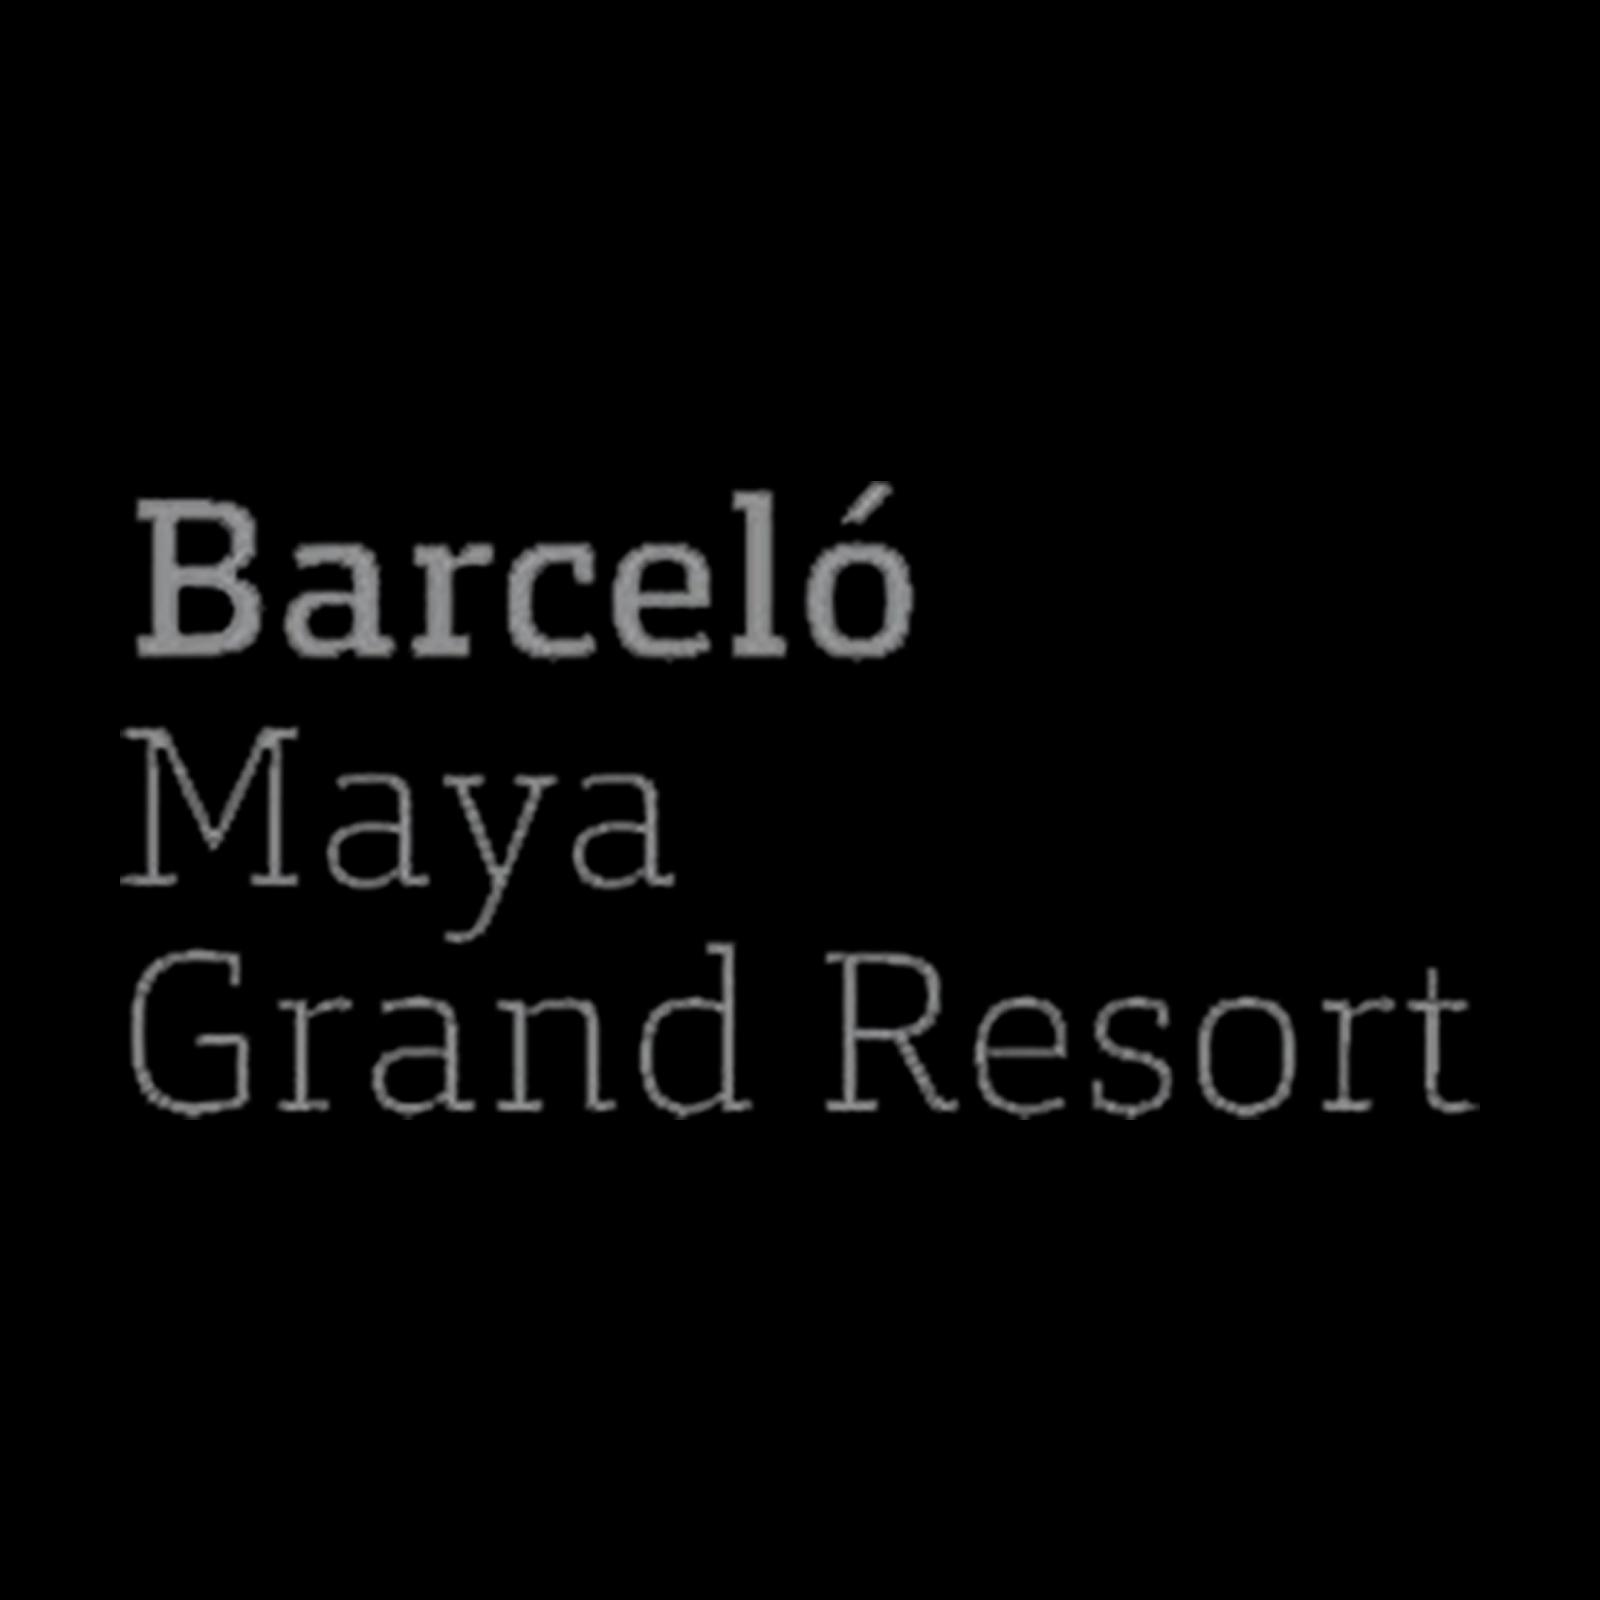 BarceloMaya